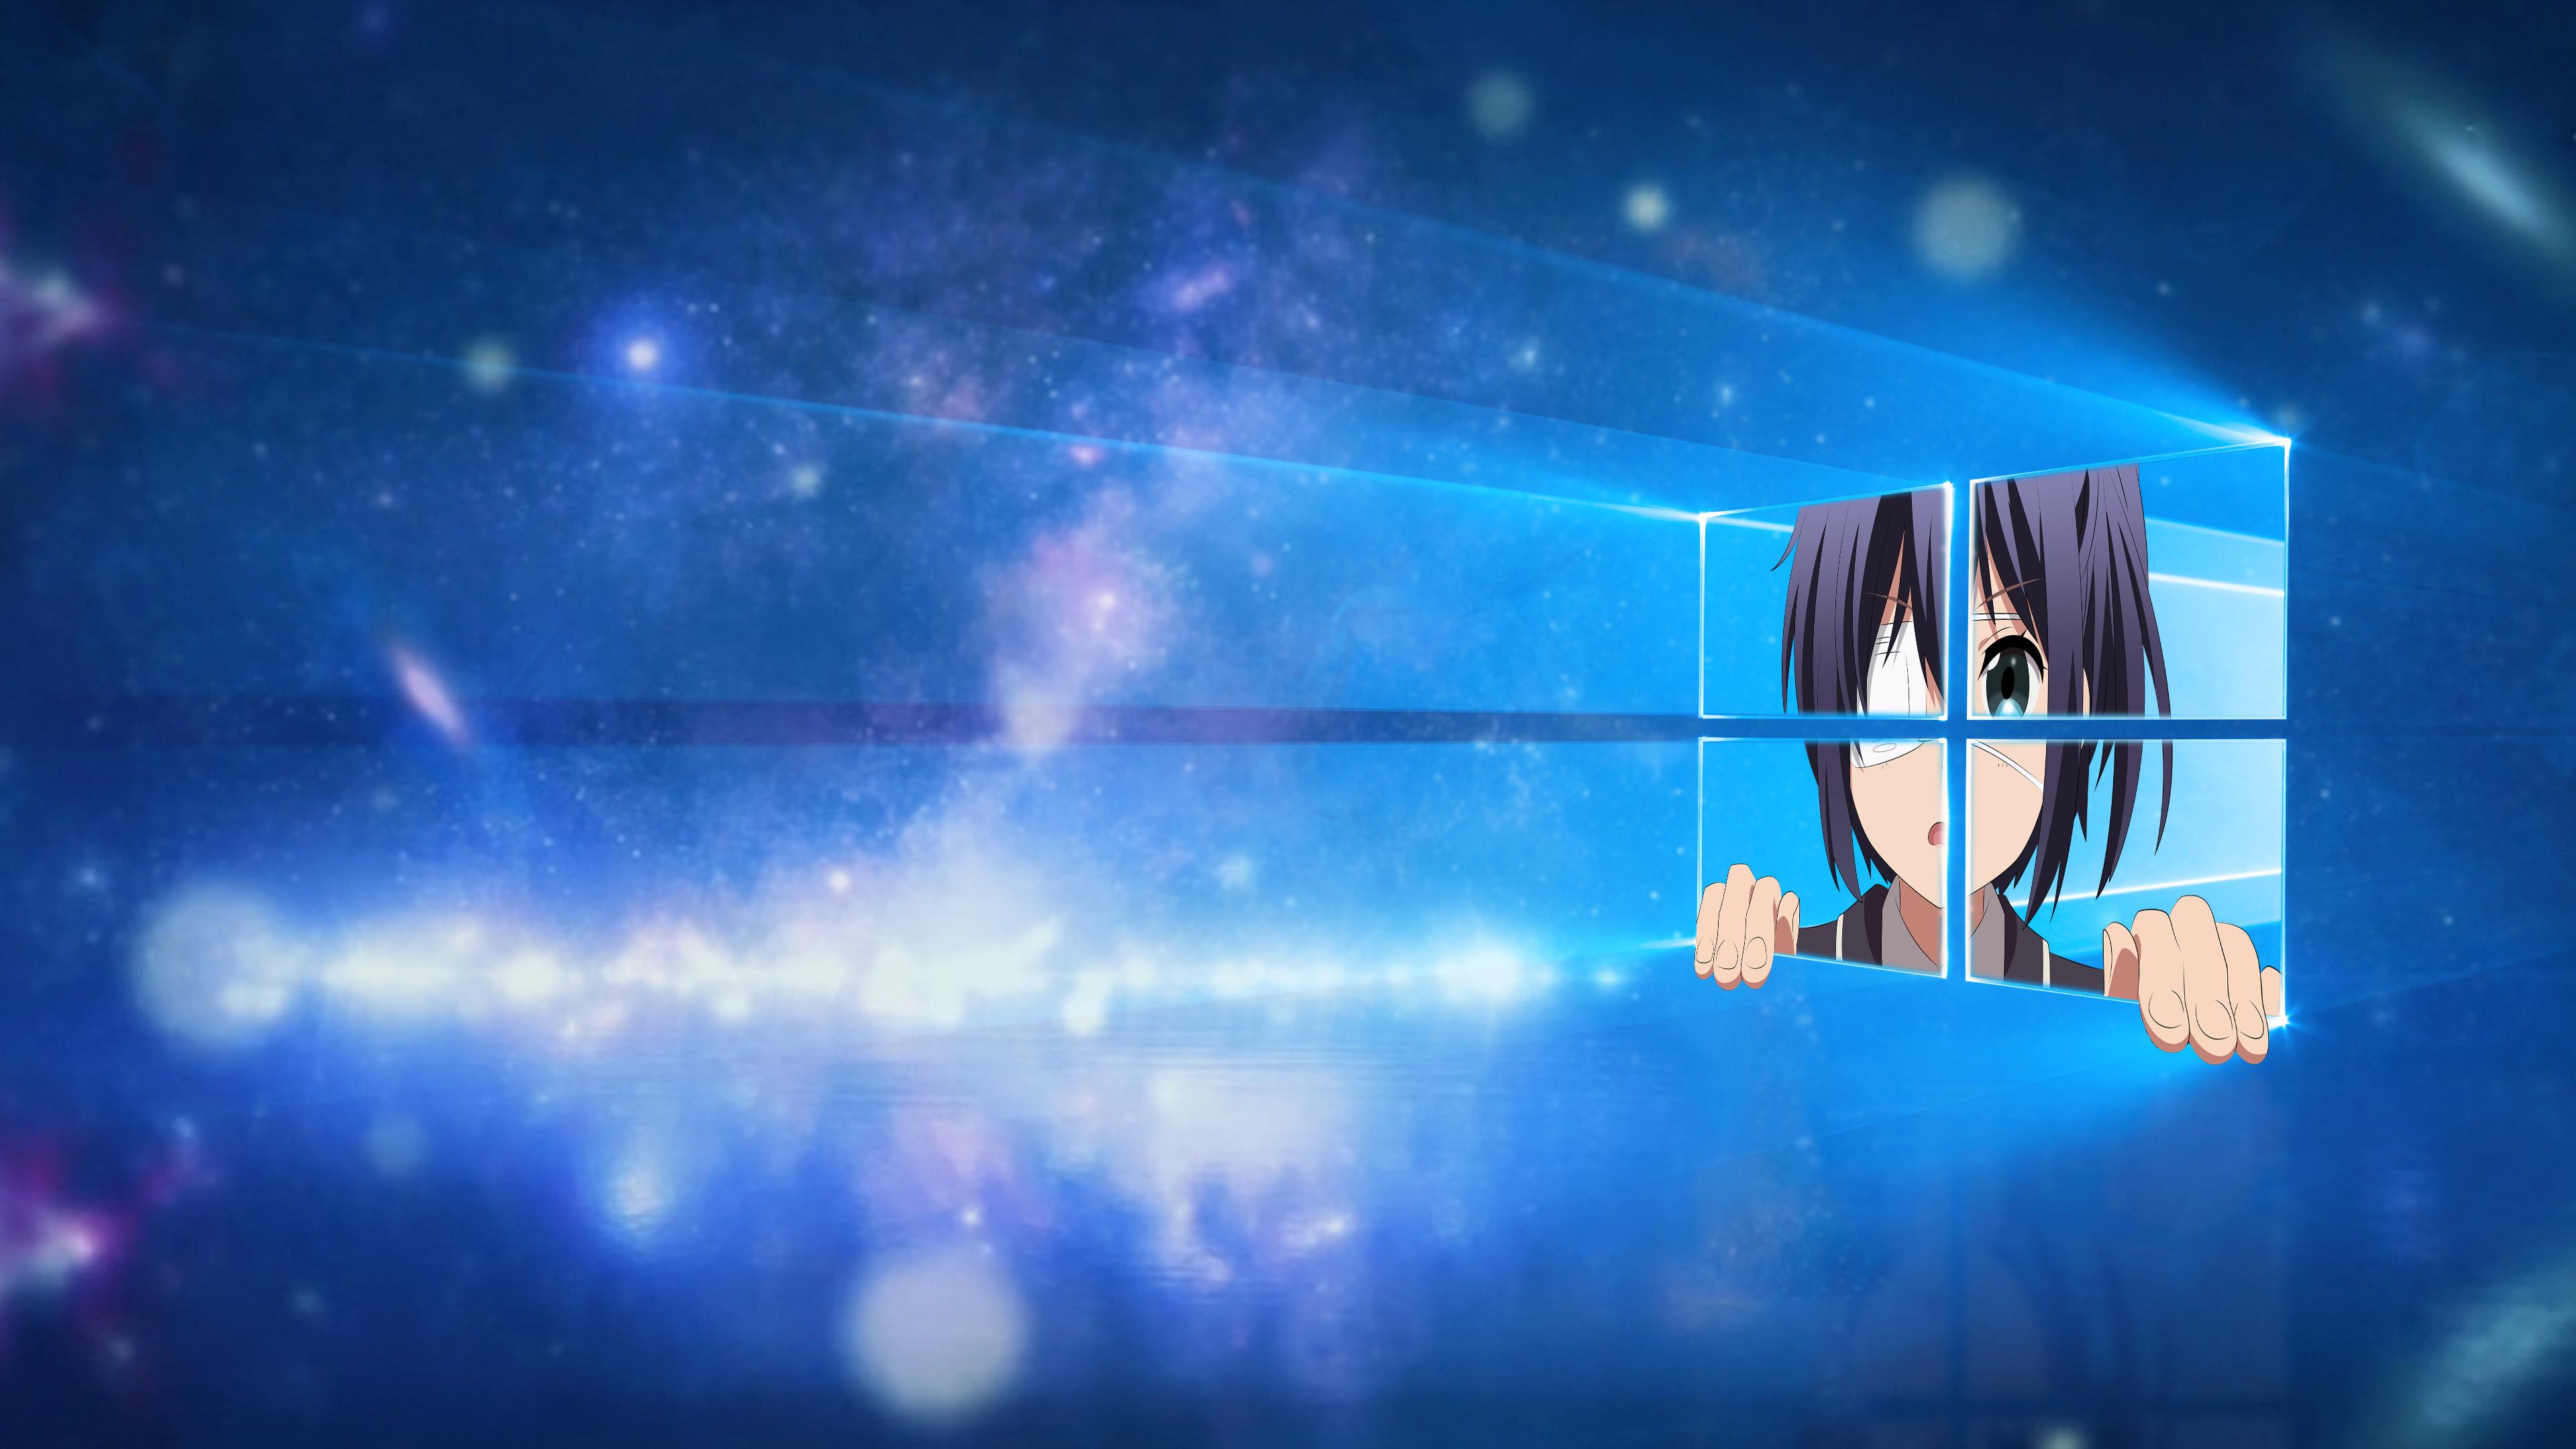 46 Anime Girl Wallpaper Windows 10 On Wallpapersafari